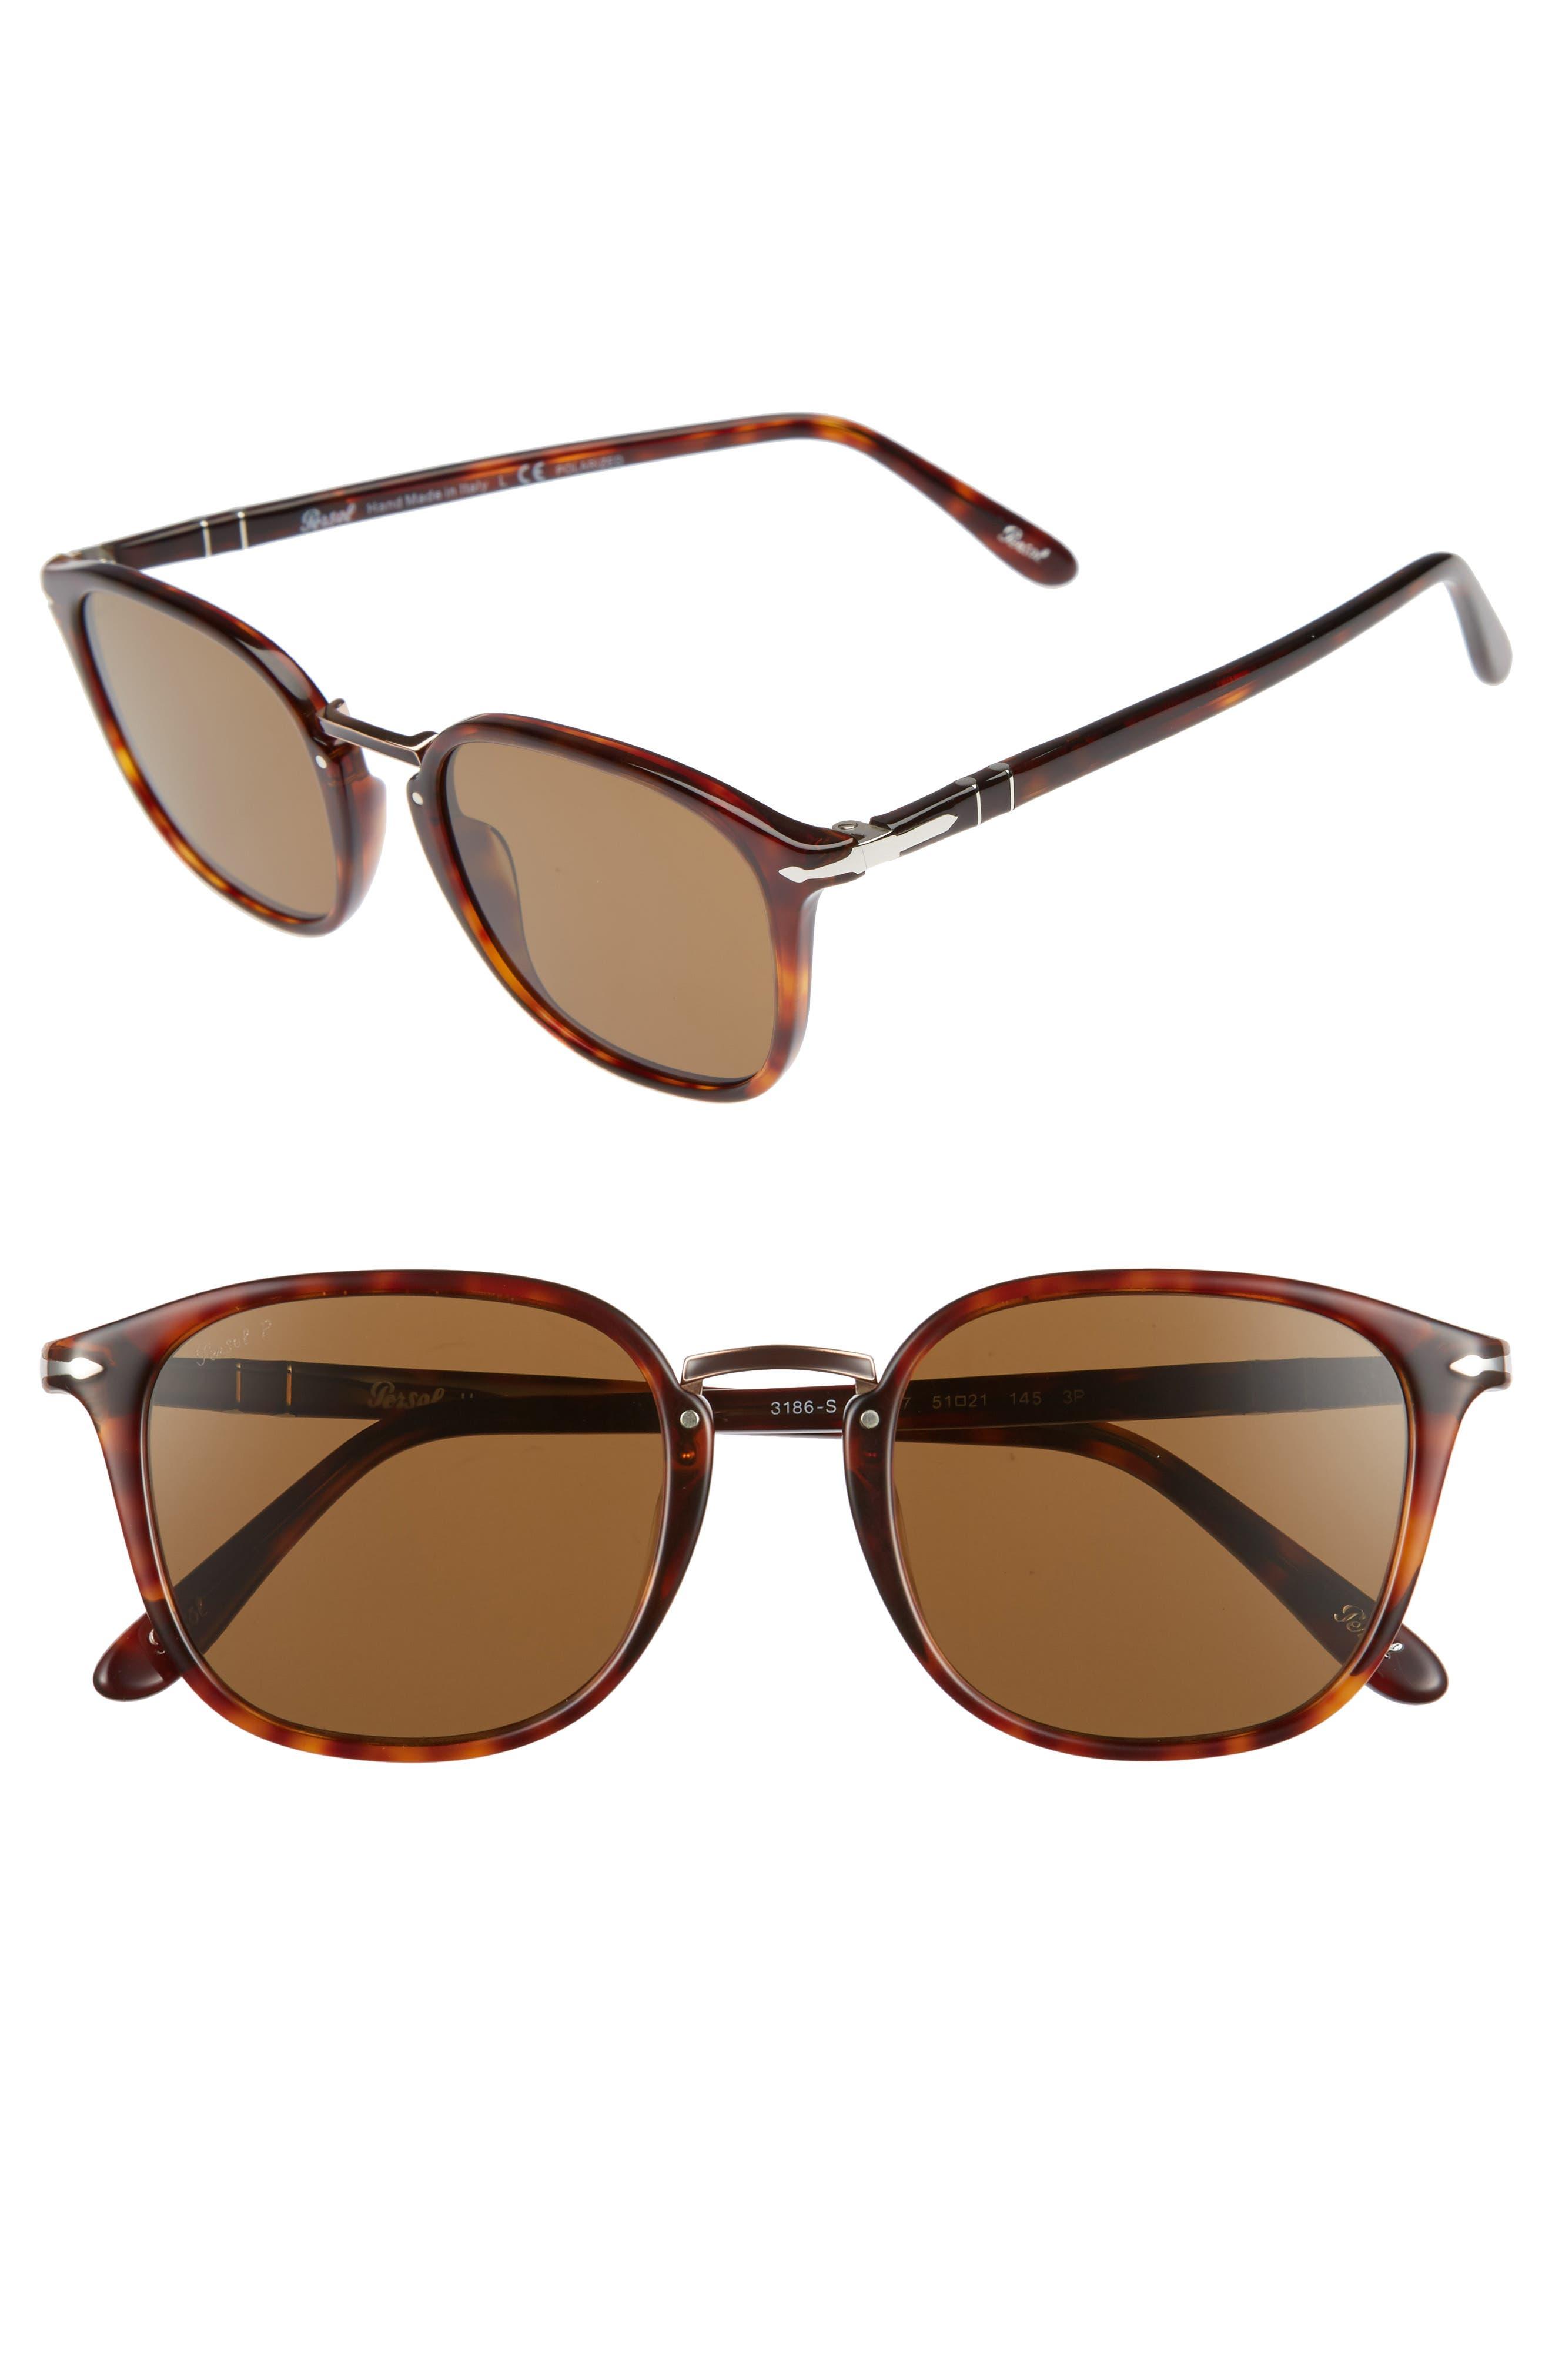 Phantos 51mm Polarized Sunglasses,                         Main,                         color, Tortoise Polarized